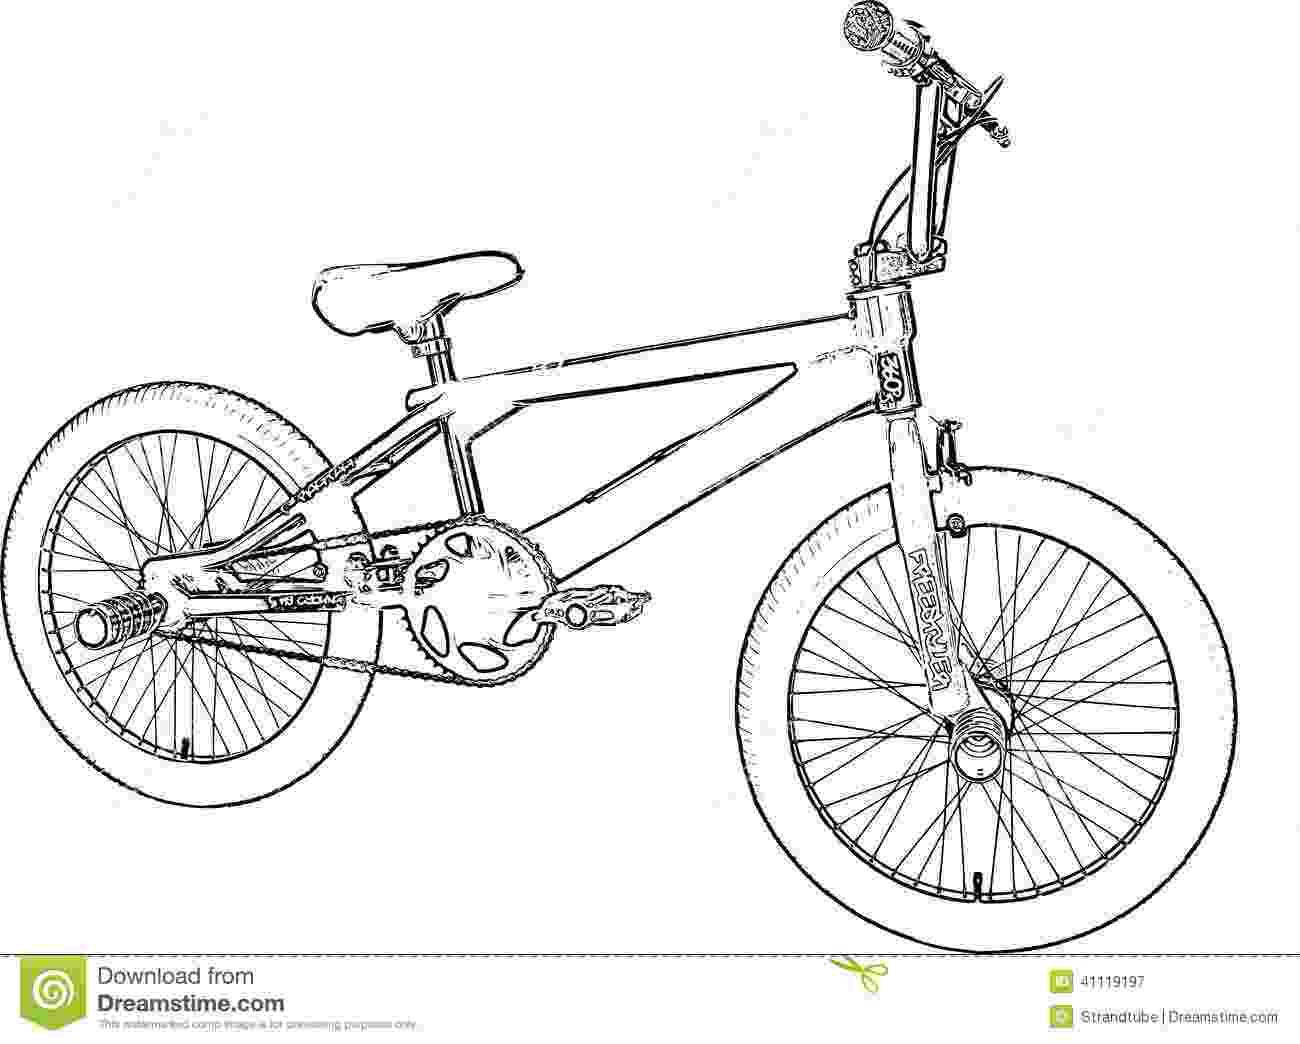 bicycle sketch bmx sketch stock illustration illustration of bicycle sketch